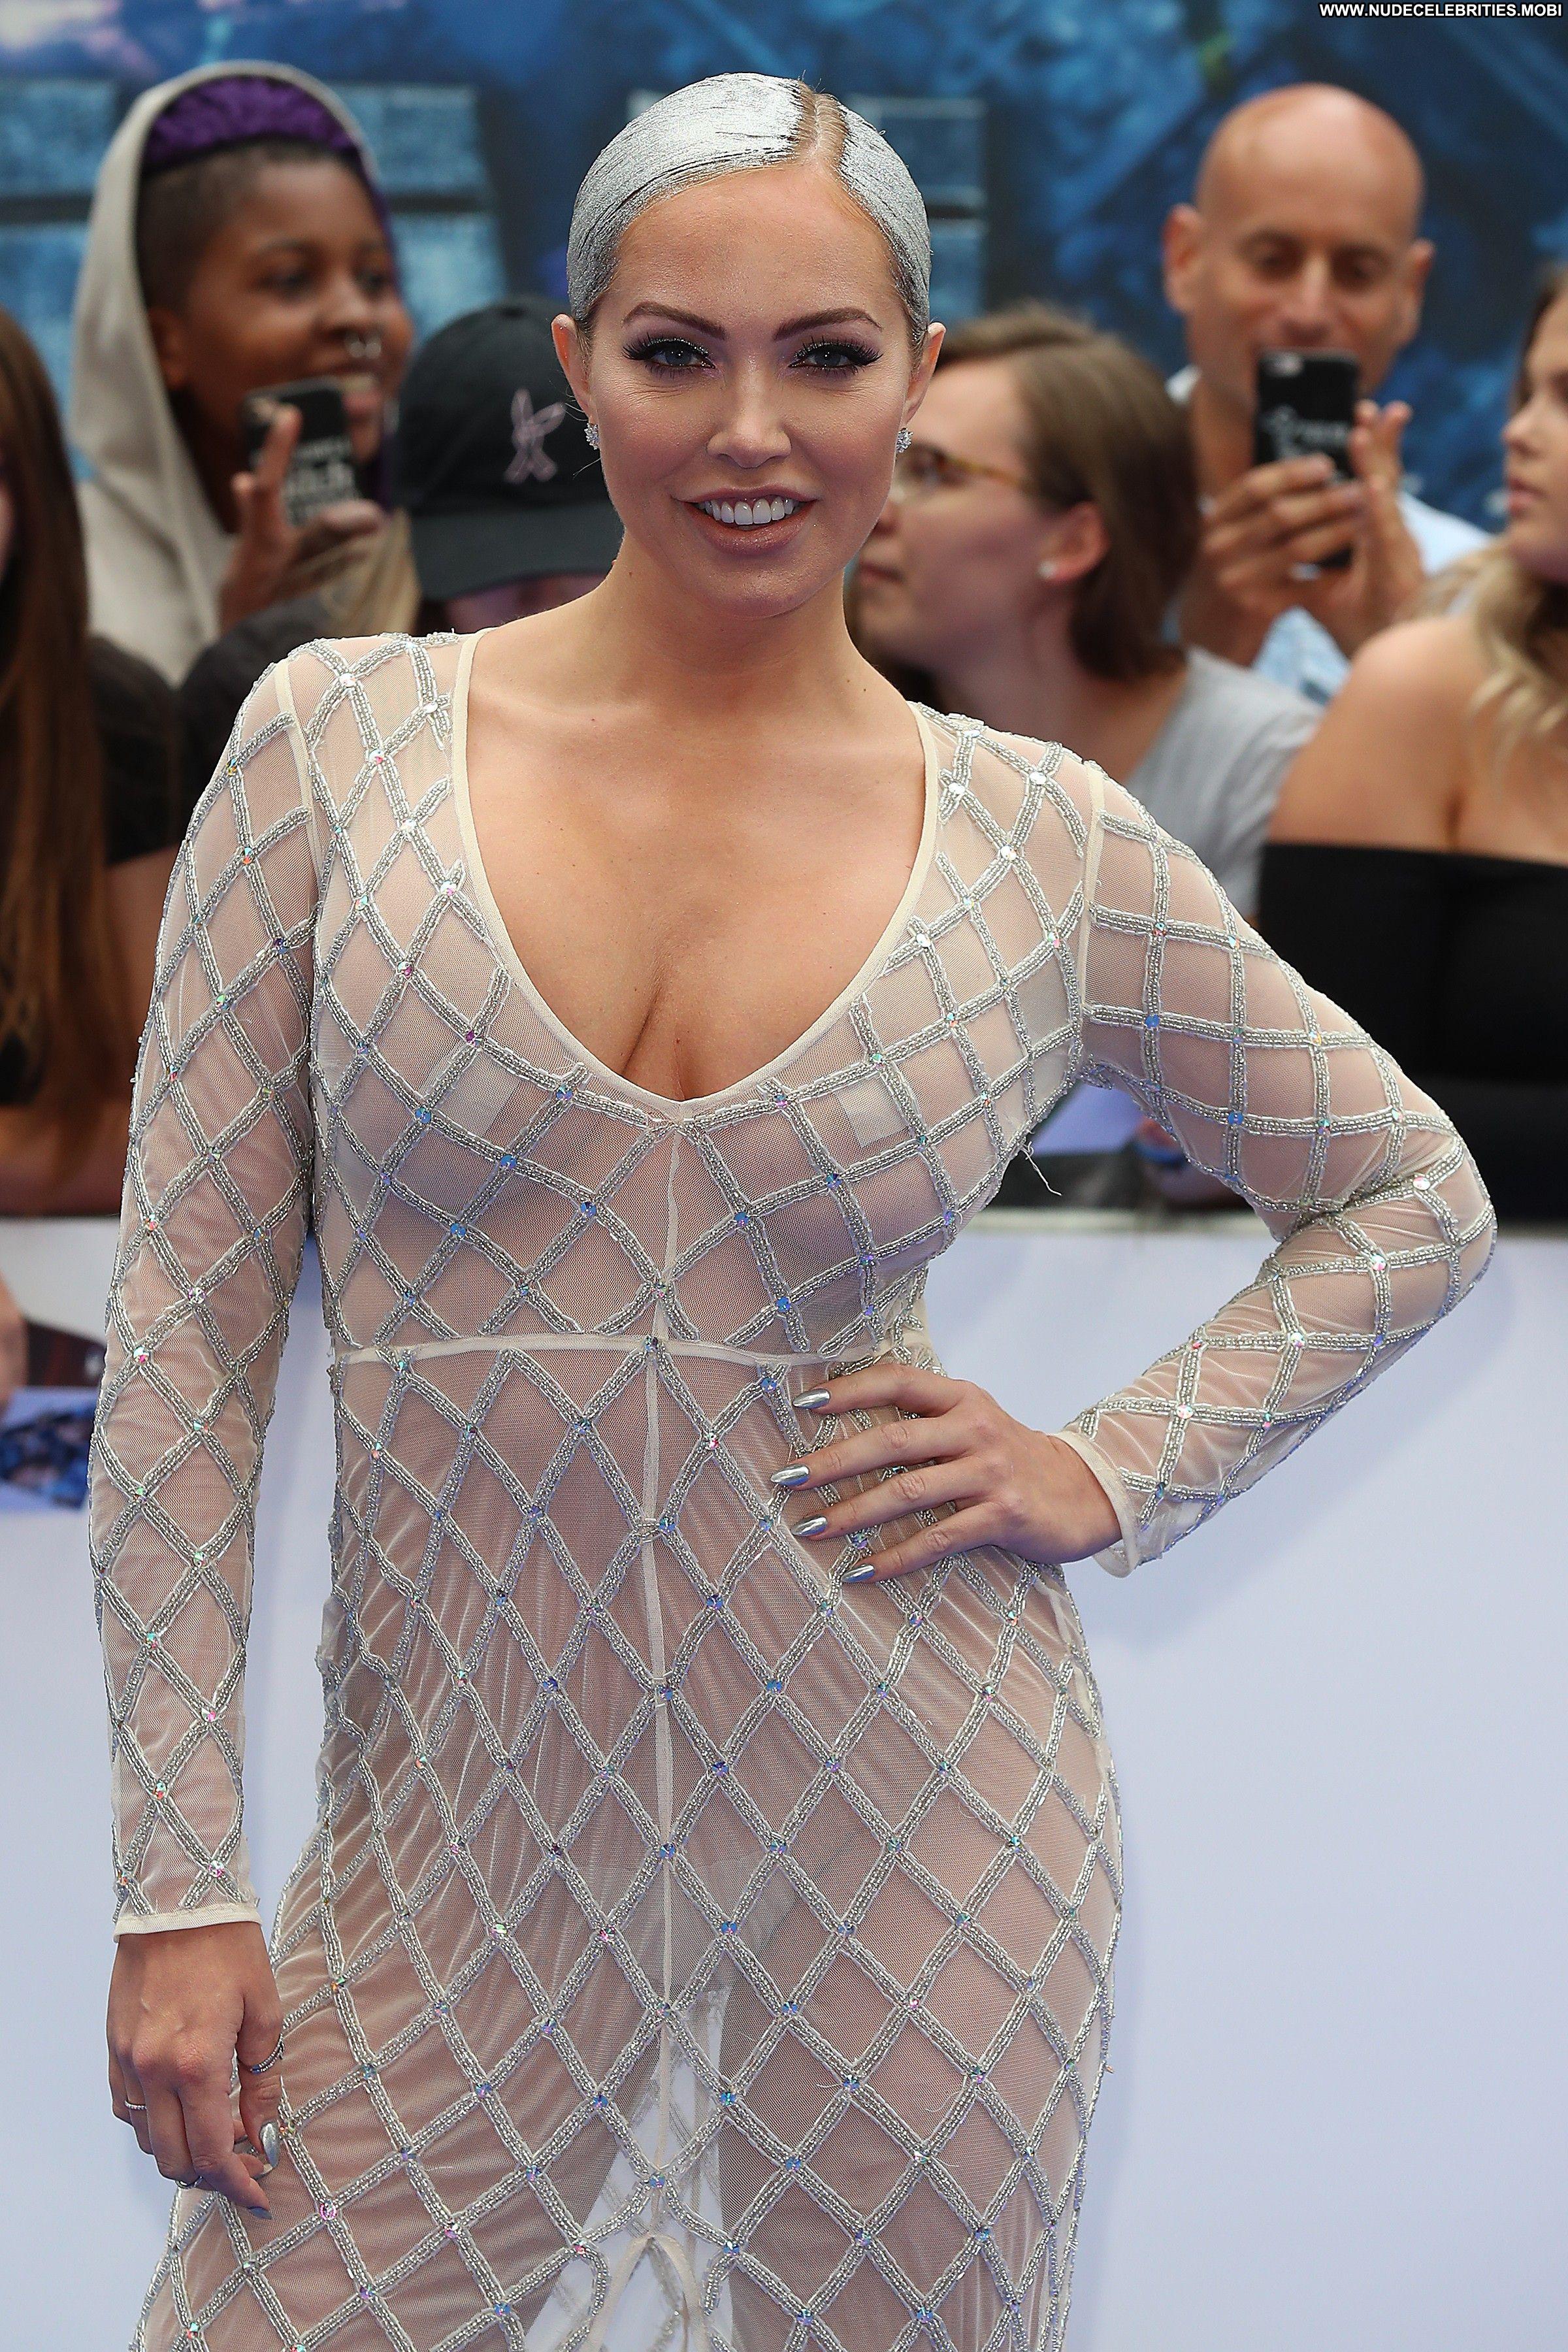 Aisleyne Horgan Wallace No Source Celebrity Beautiful Babe